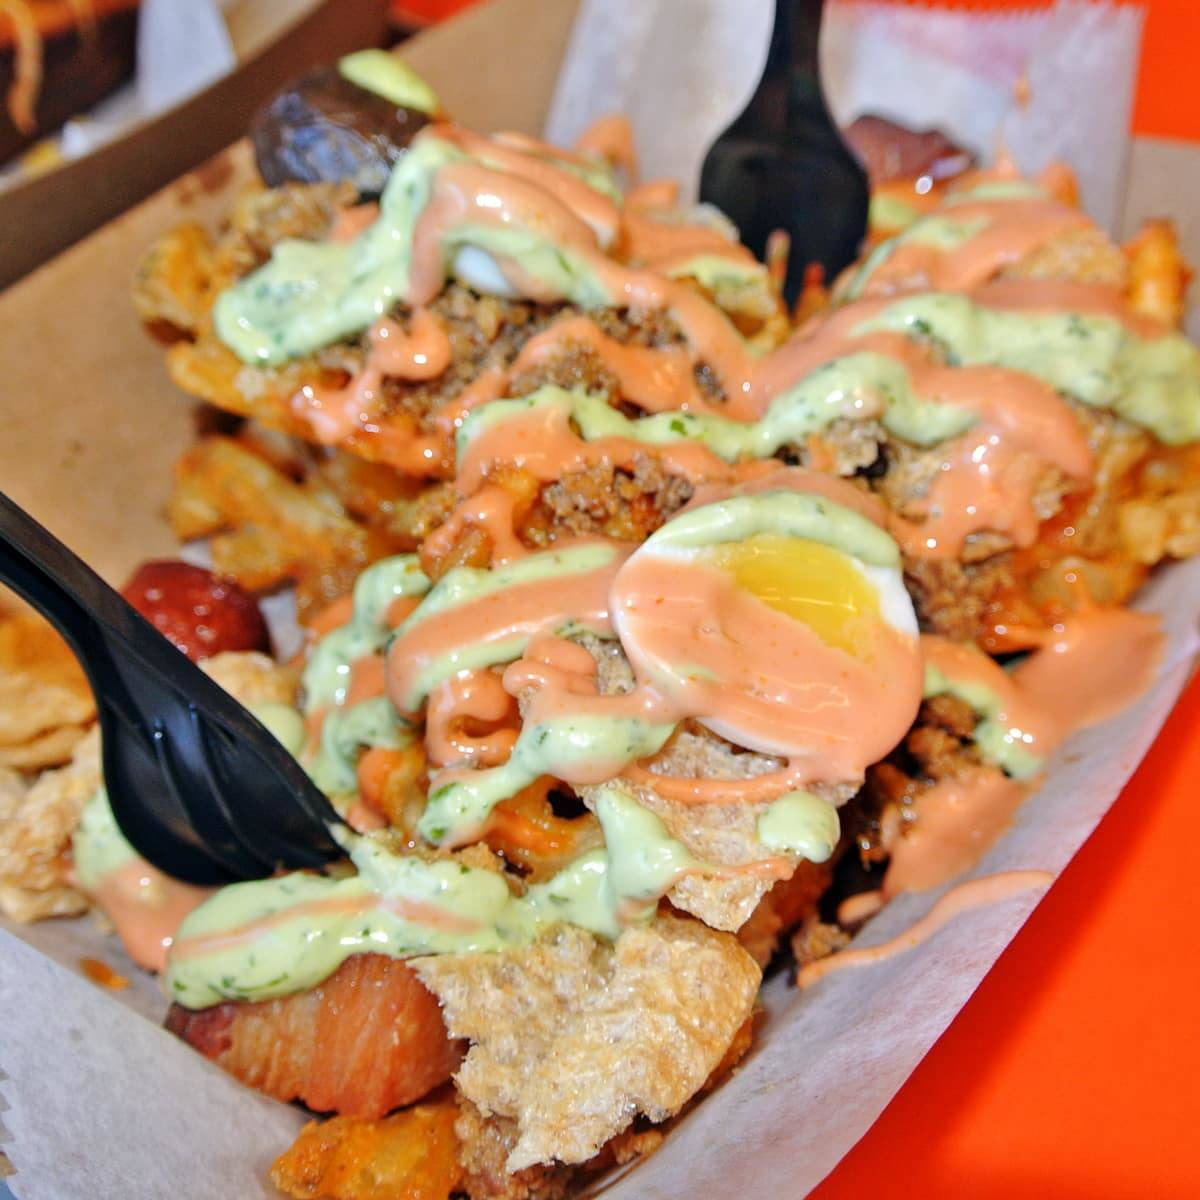 Hot Dog Insanity at Los Perros Locos LES